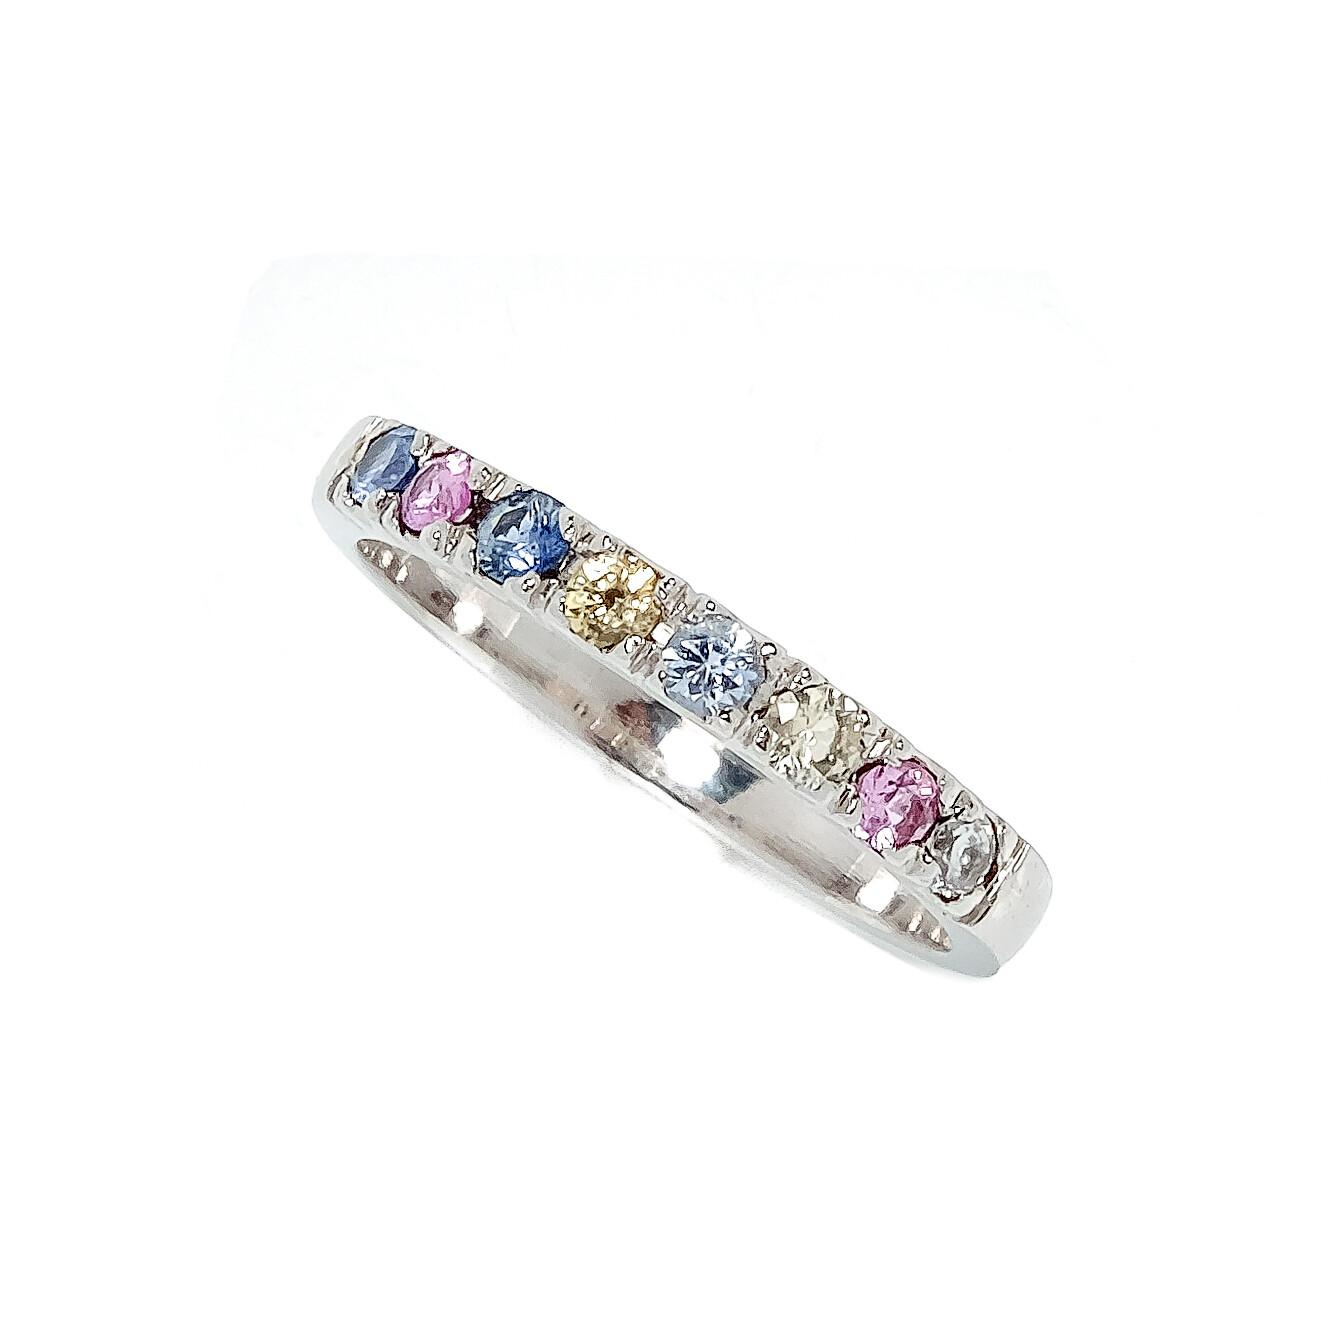 Elemental Half Eternity Ring - Sapphires - 6.5⌀ (14KT)